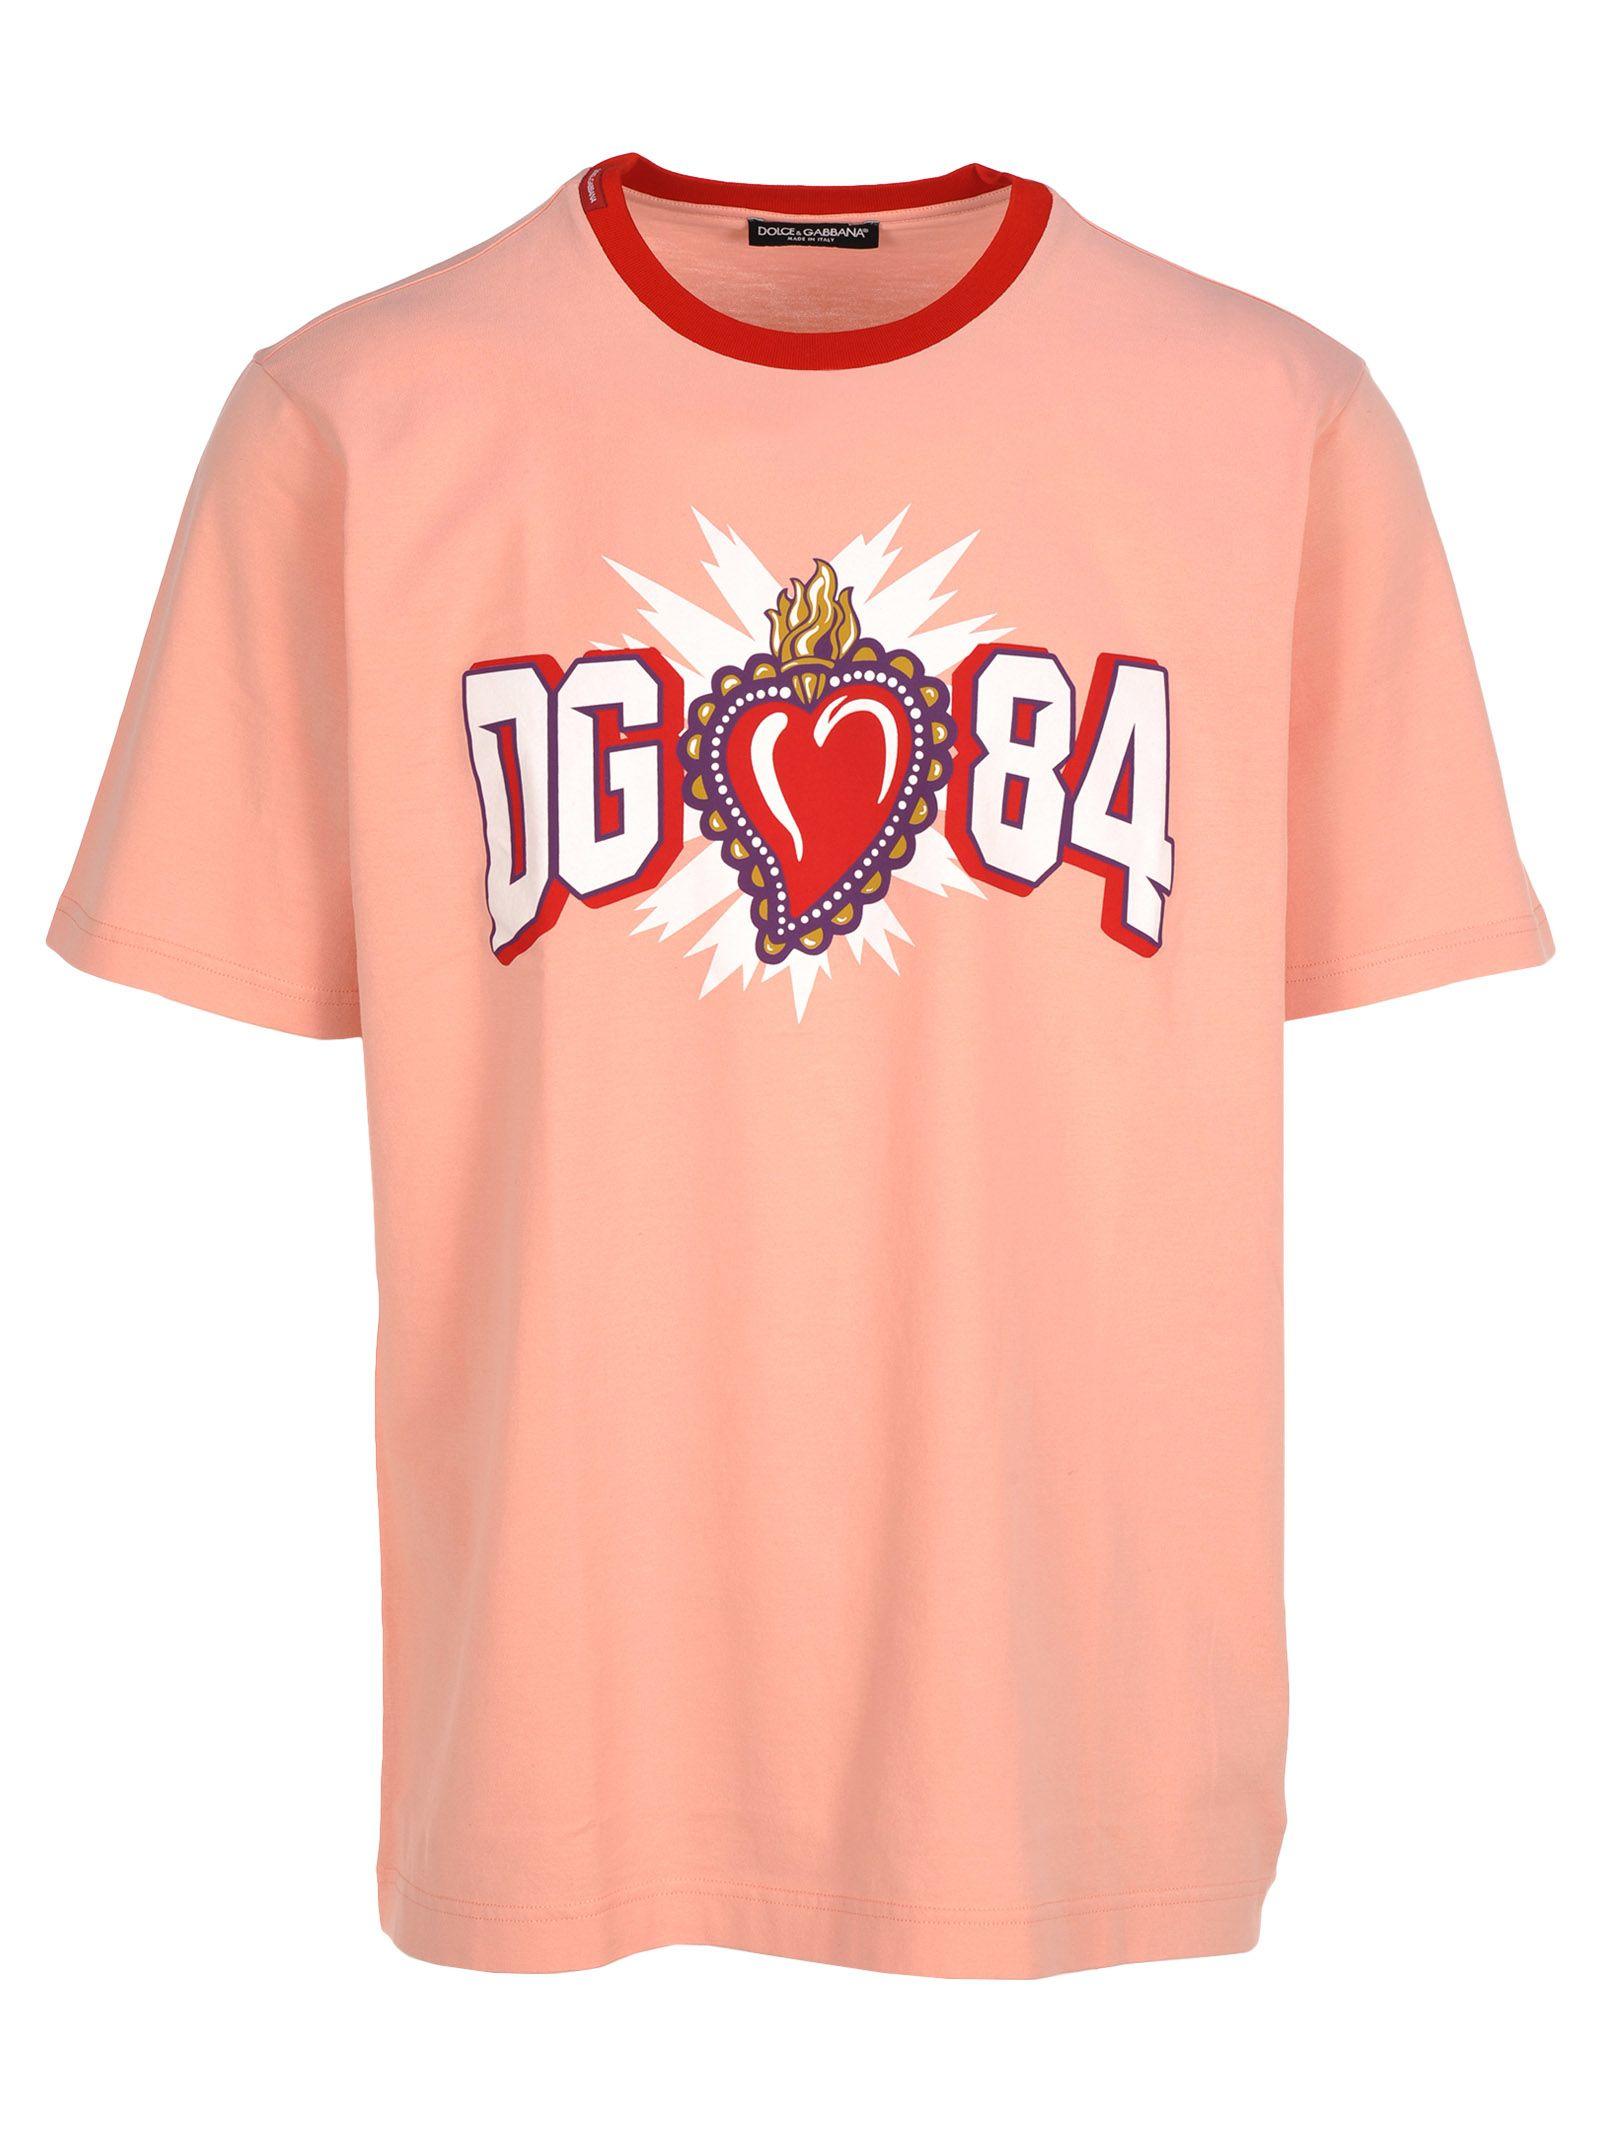 Dolce & gabbana Tshirt Logo Cuore Sacro